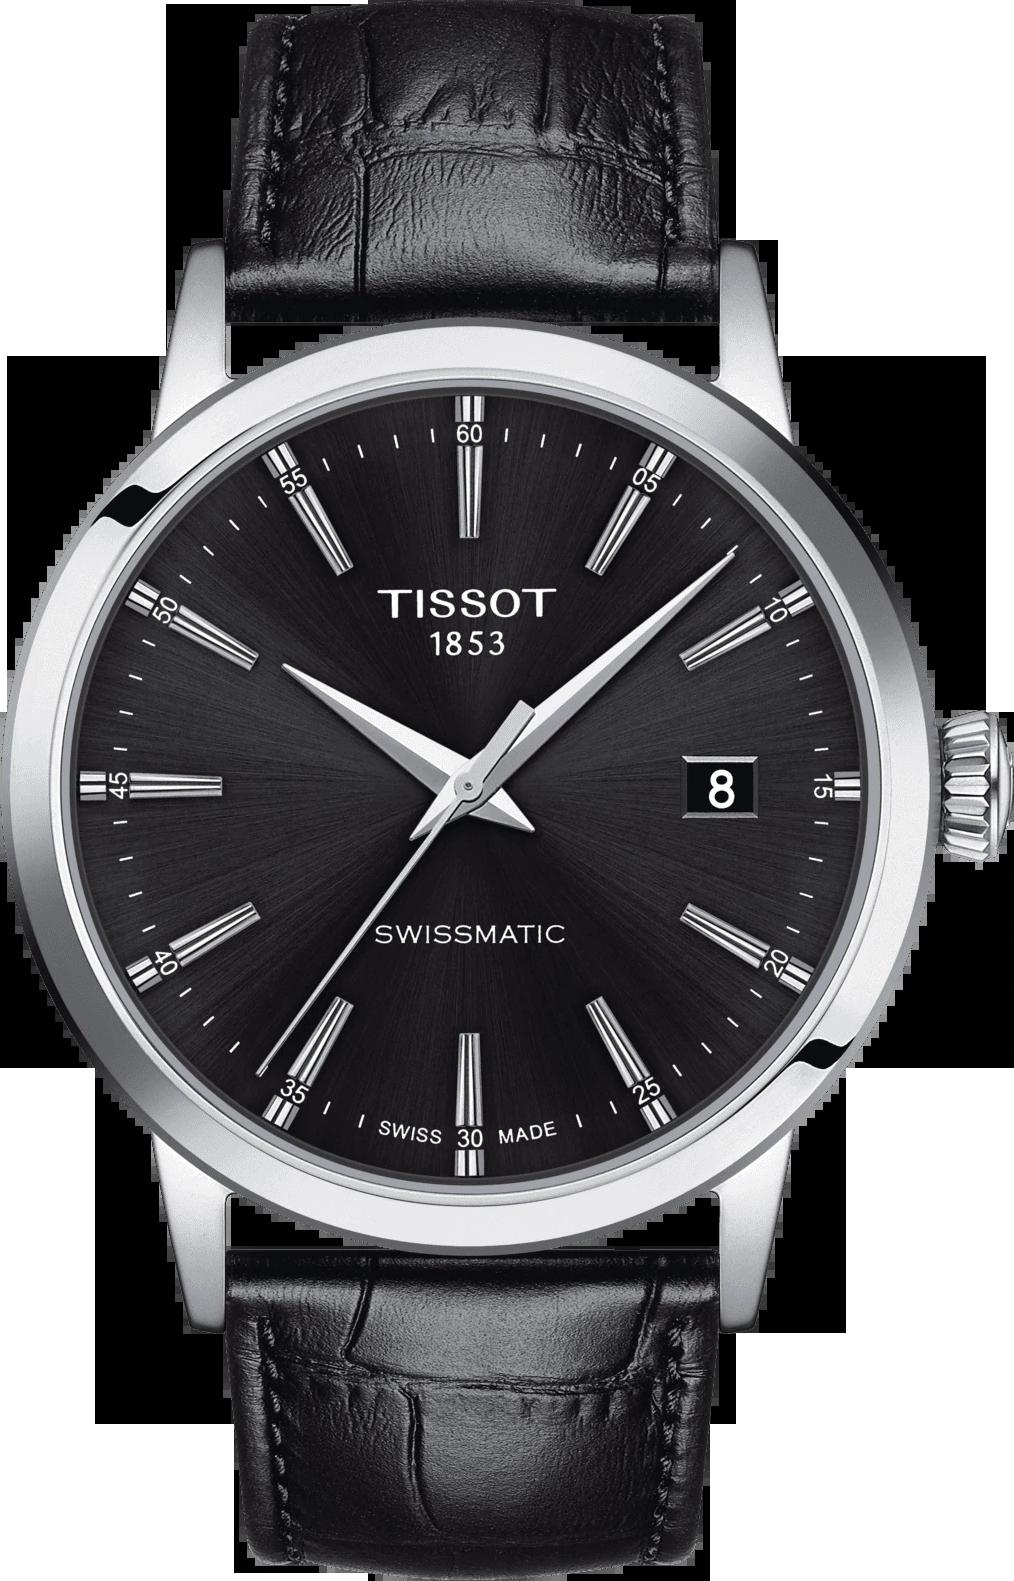 Tissot T129.407.16.051.00